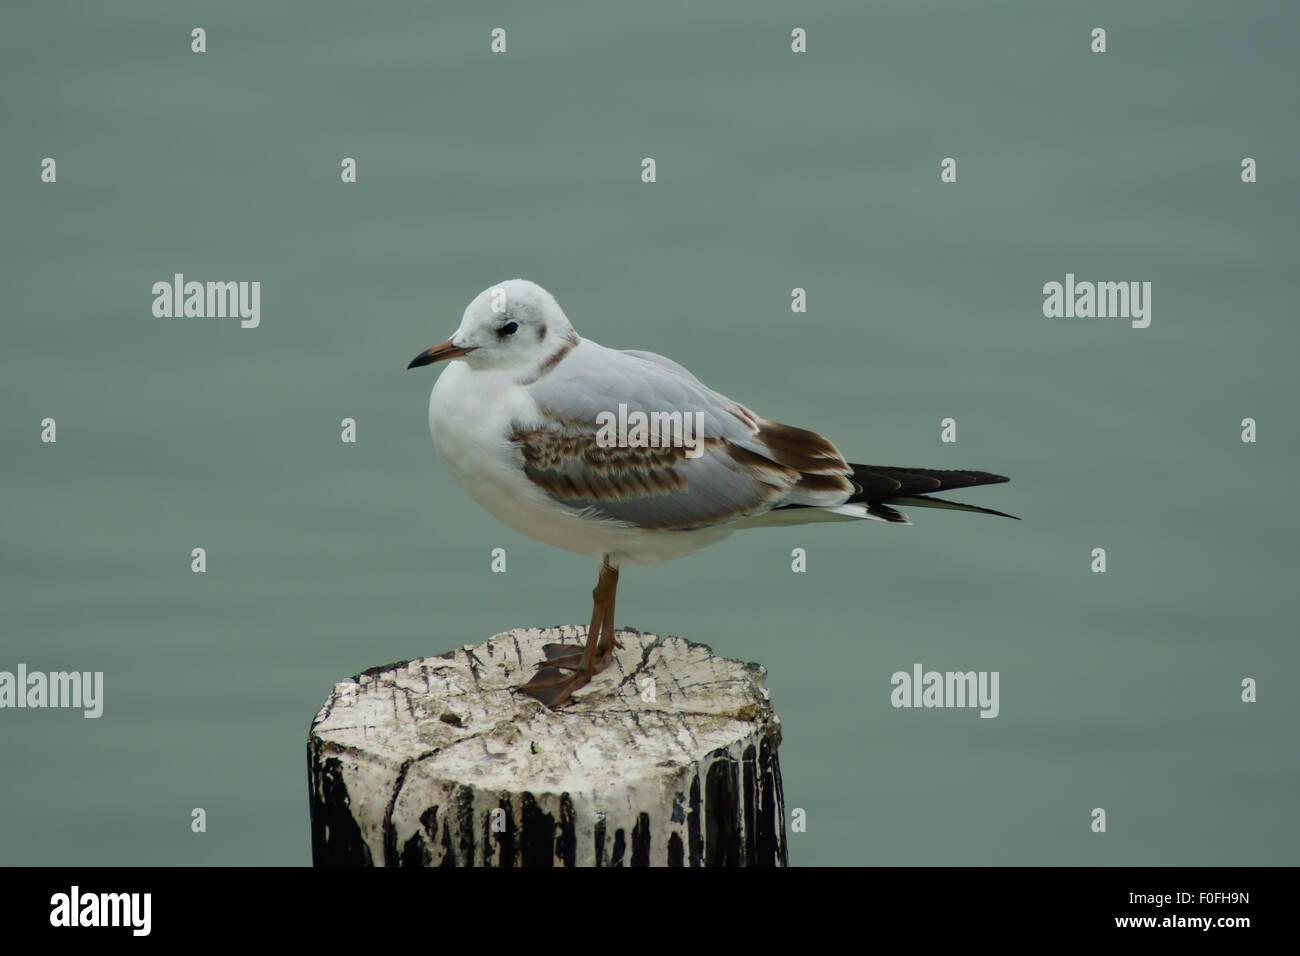 Heron Gull Stock Photos & Heron Gull Stock Images - Alamy